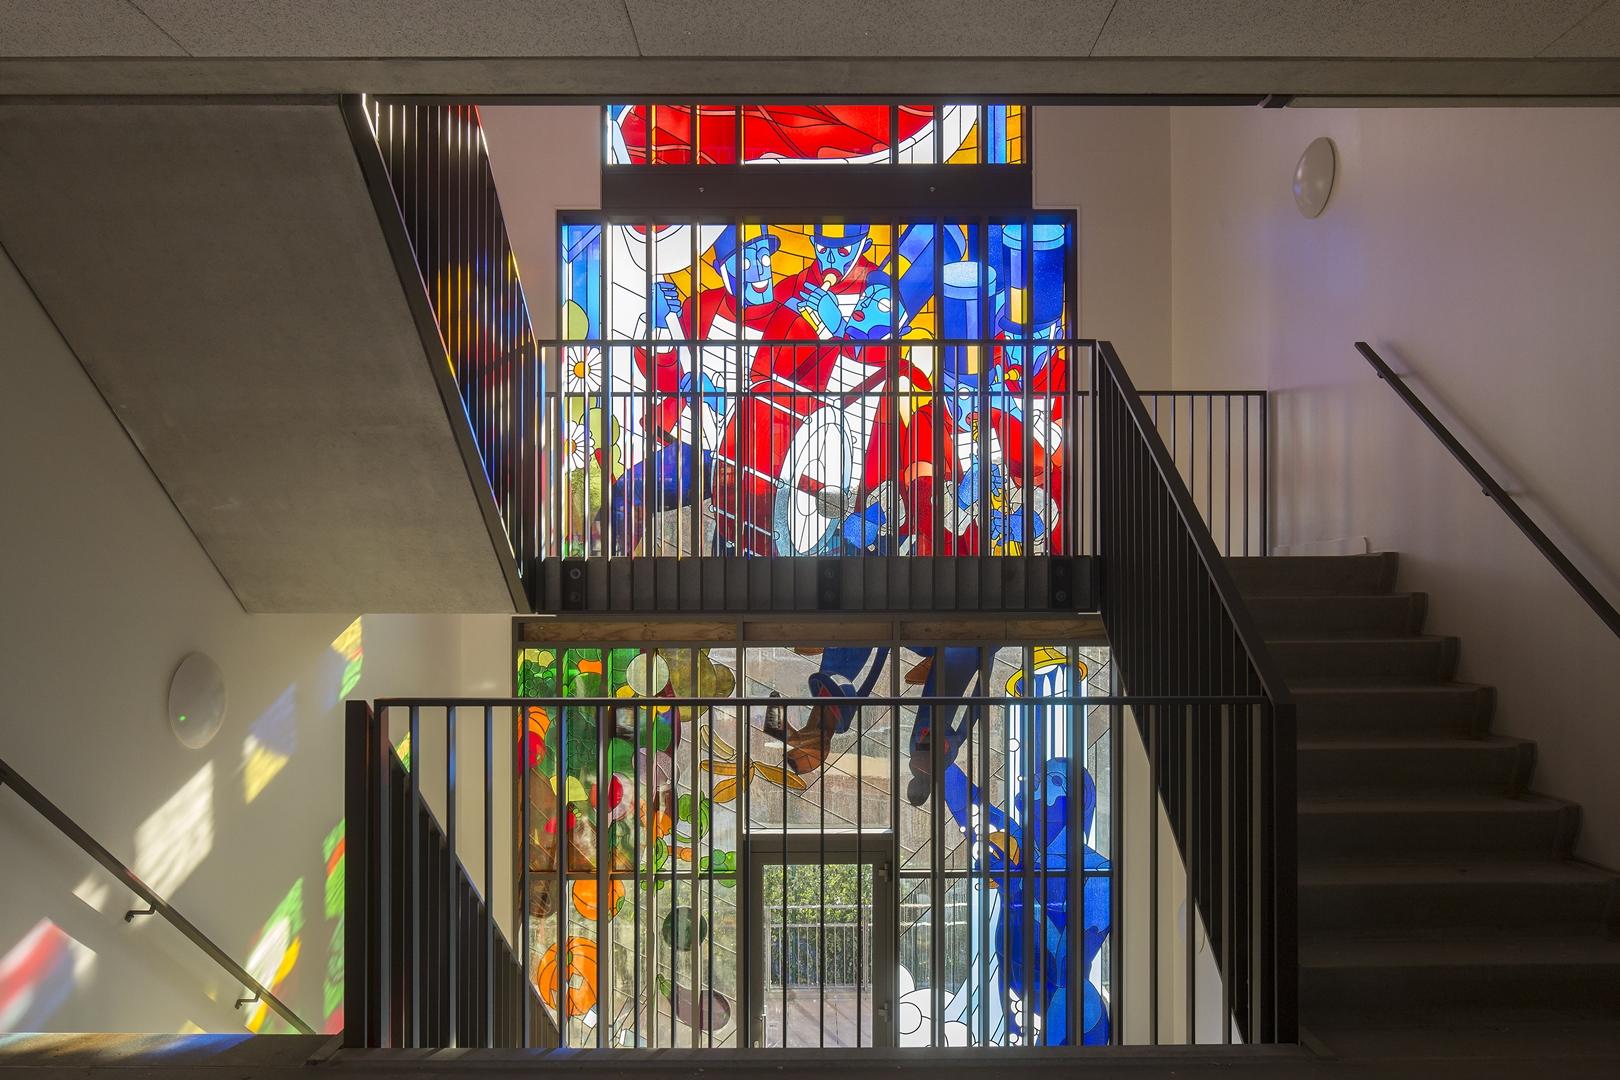 Woongebouw met grote glas in lood ramen geopend   architectenweb.nl